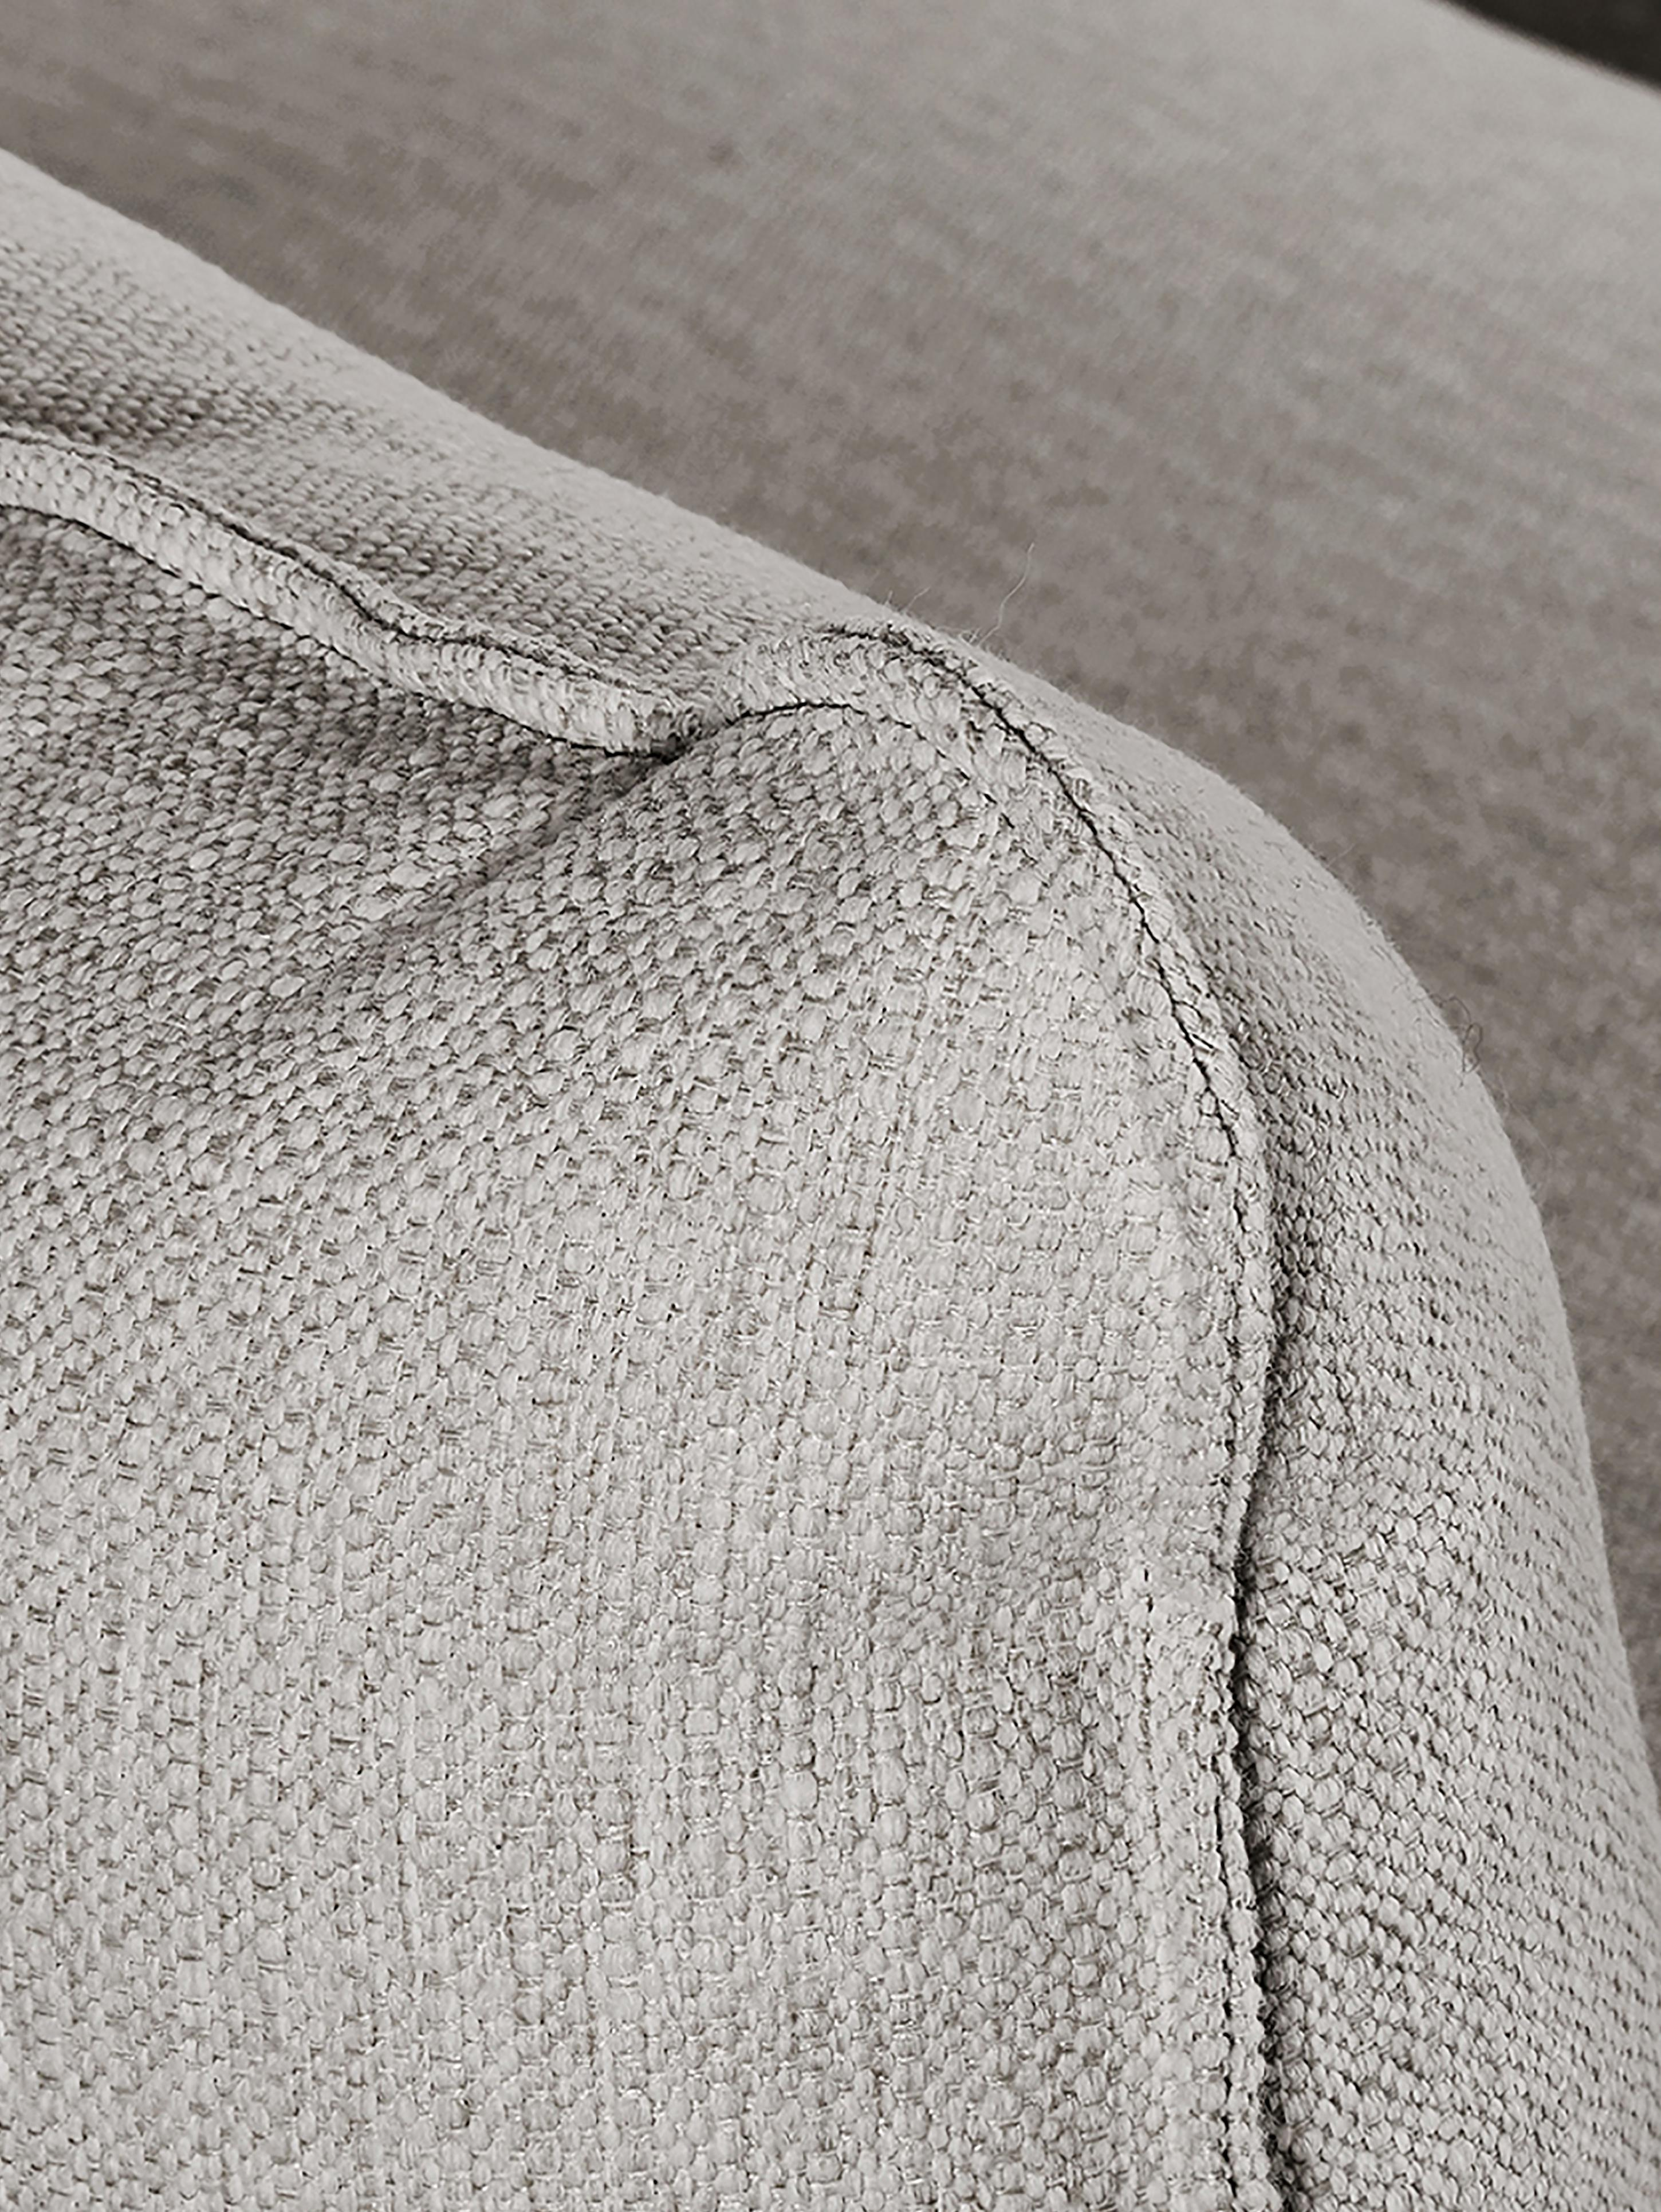 XL-Ecksofa Tribeca, Bezug: Polyester Der hochwertige, Gestell: Massives Kiefernholz, Füße: Massives Buchenholz, lack, Webstoff Beigegrau, B 405 x T 228 cm